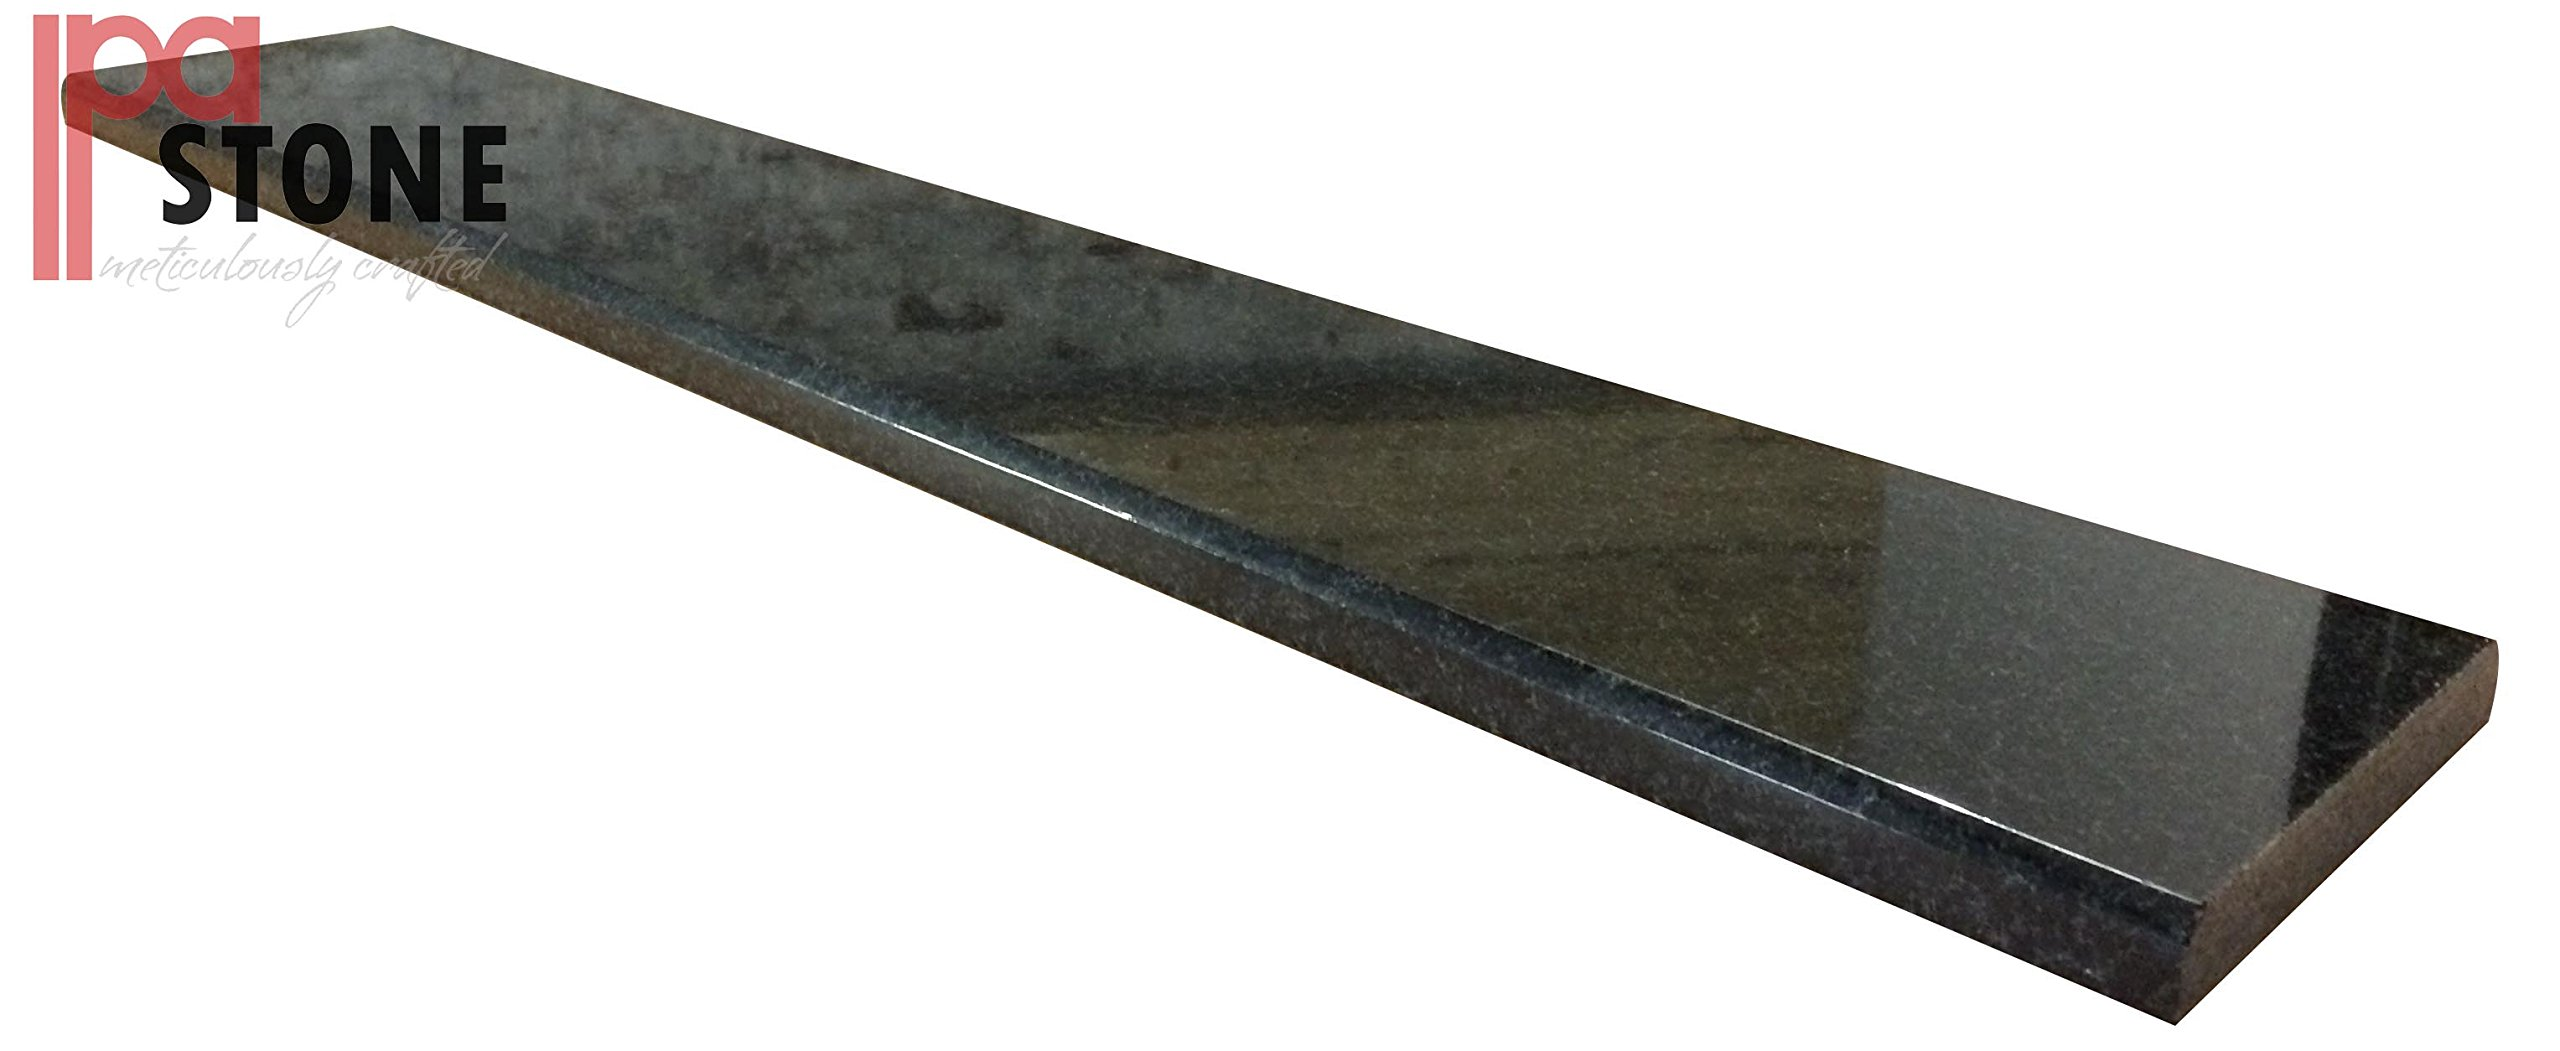 Granite Threshold Saddle - Black Absolute - Size 36 x 6 Inch - Polished